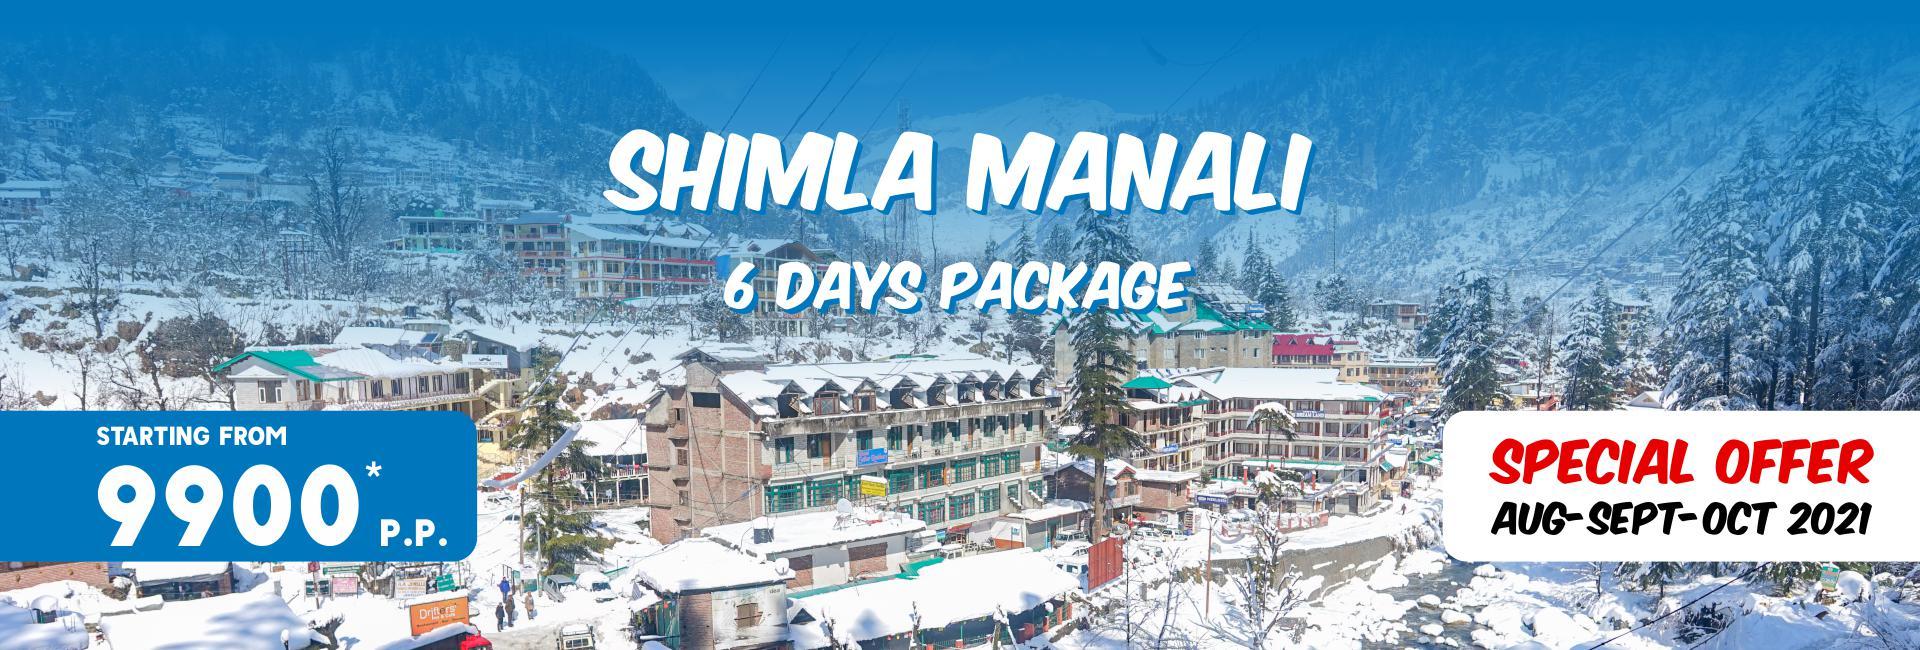 Shimla-Manali Tour Packages